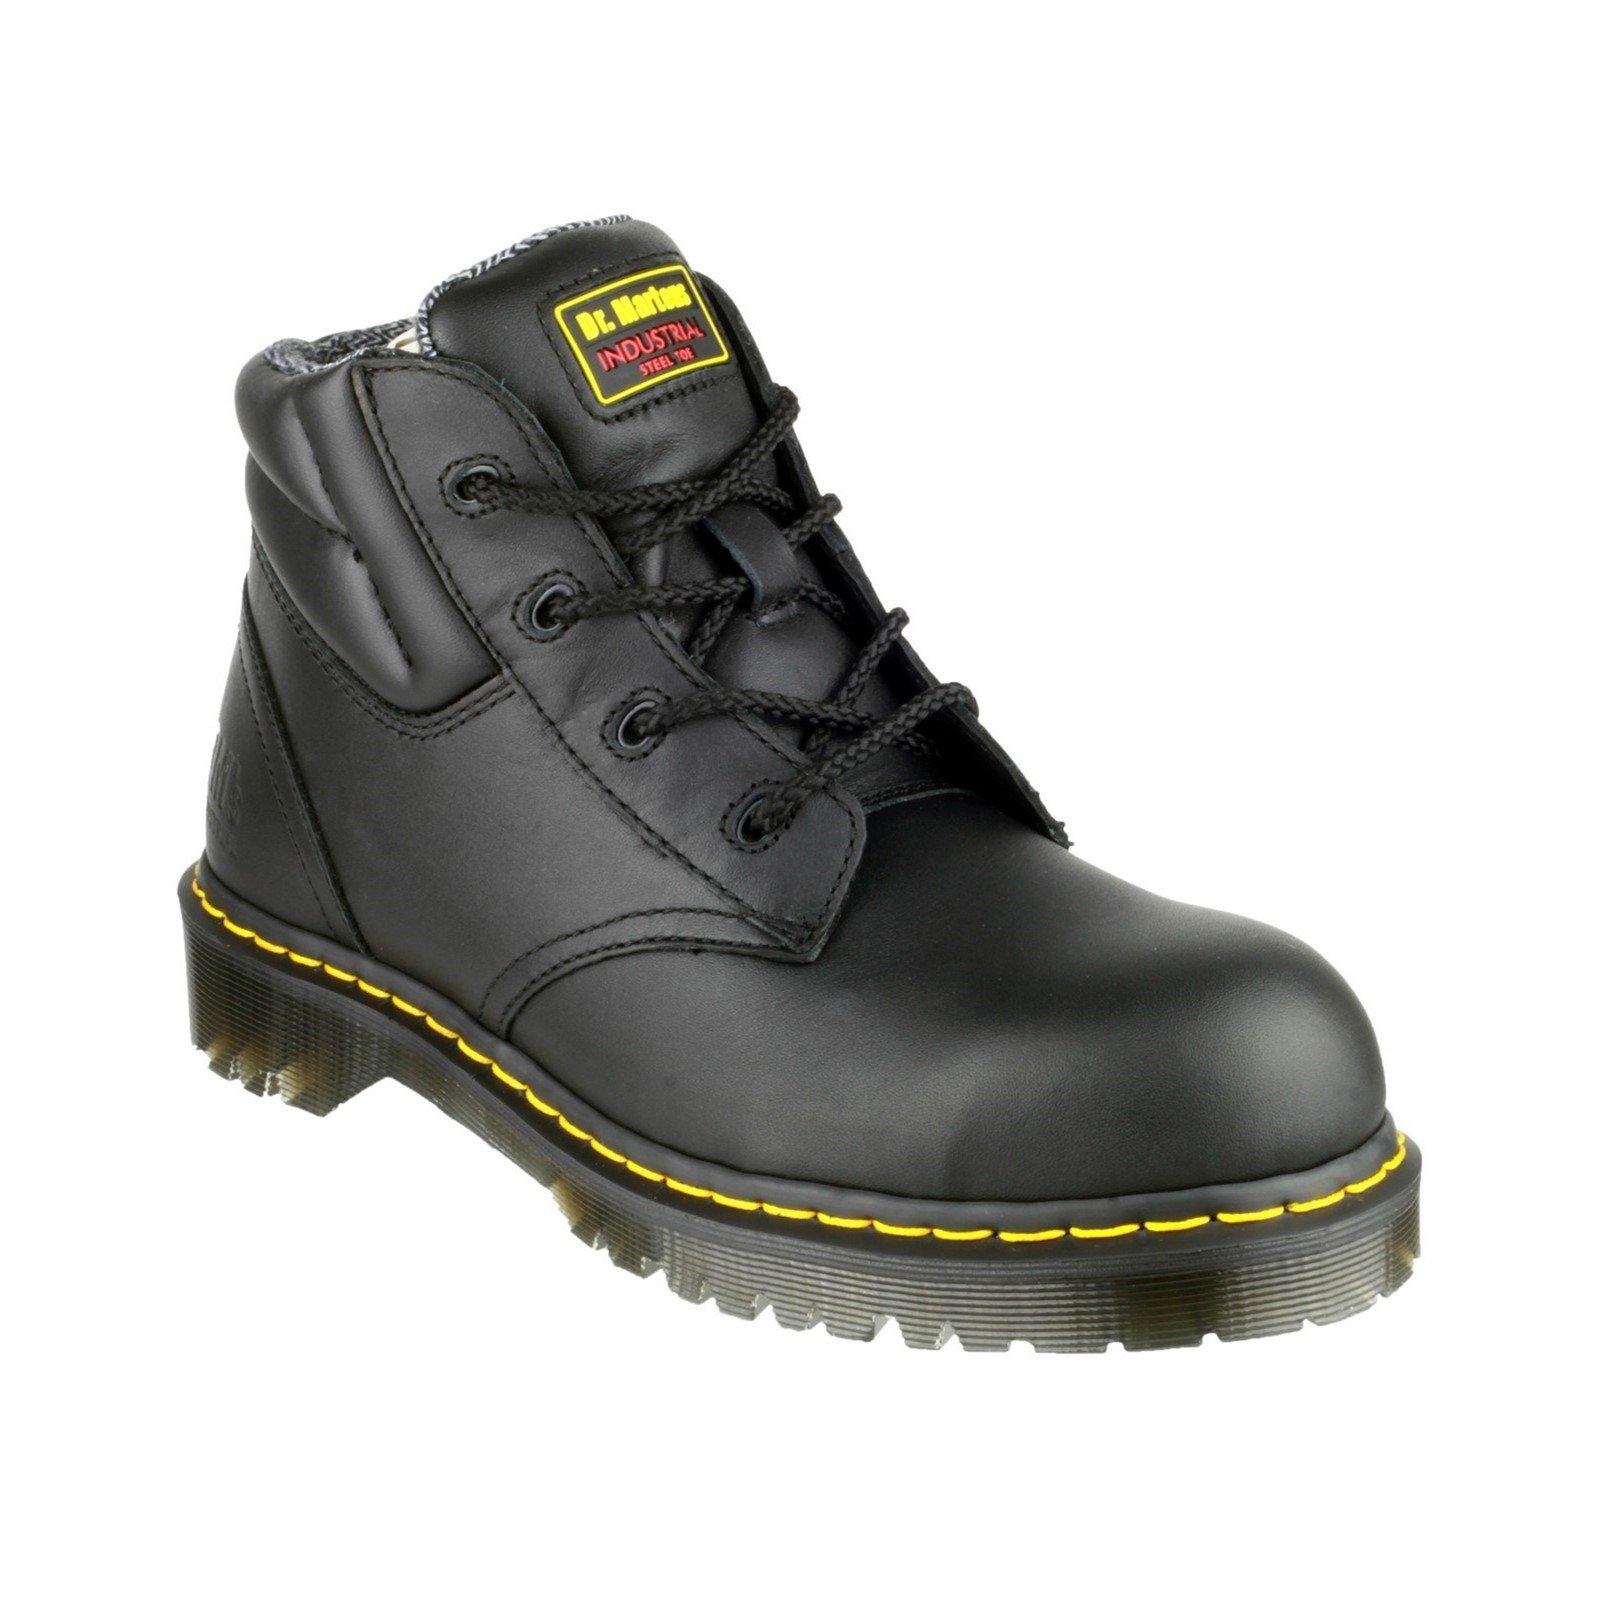 Dr Martens Unisex Lace-Up Boot Black 14068 - Black 3